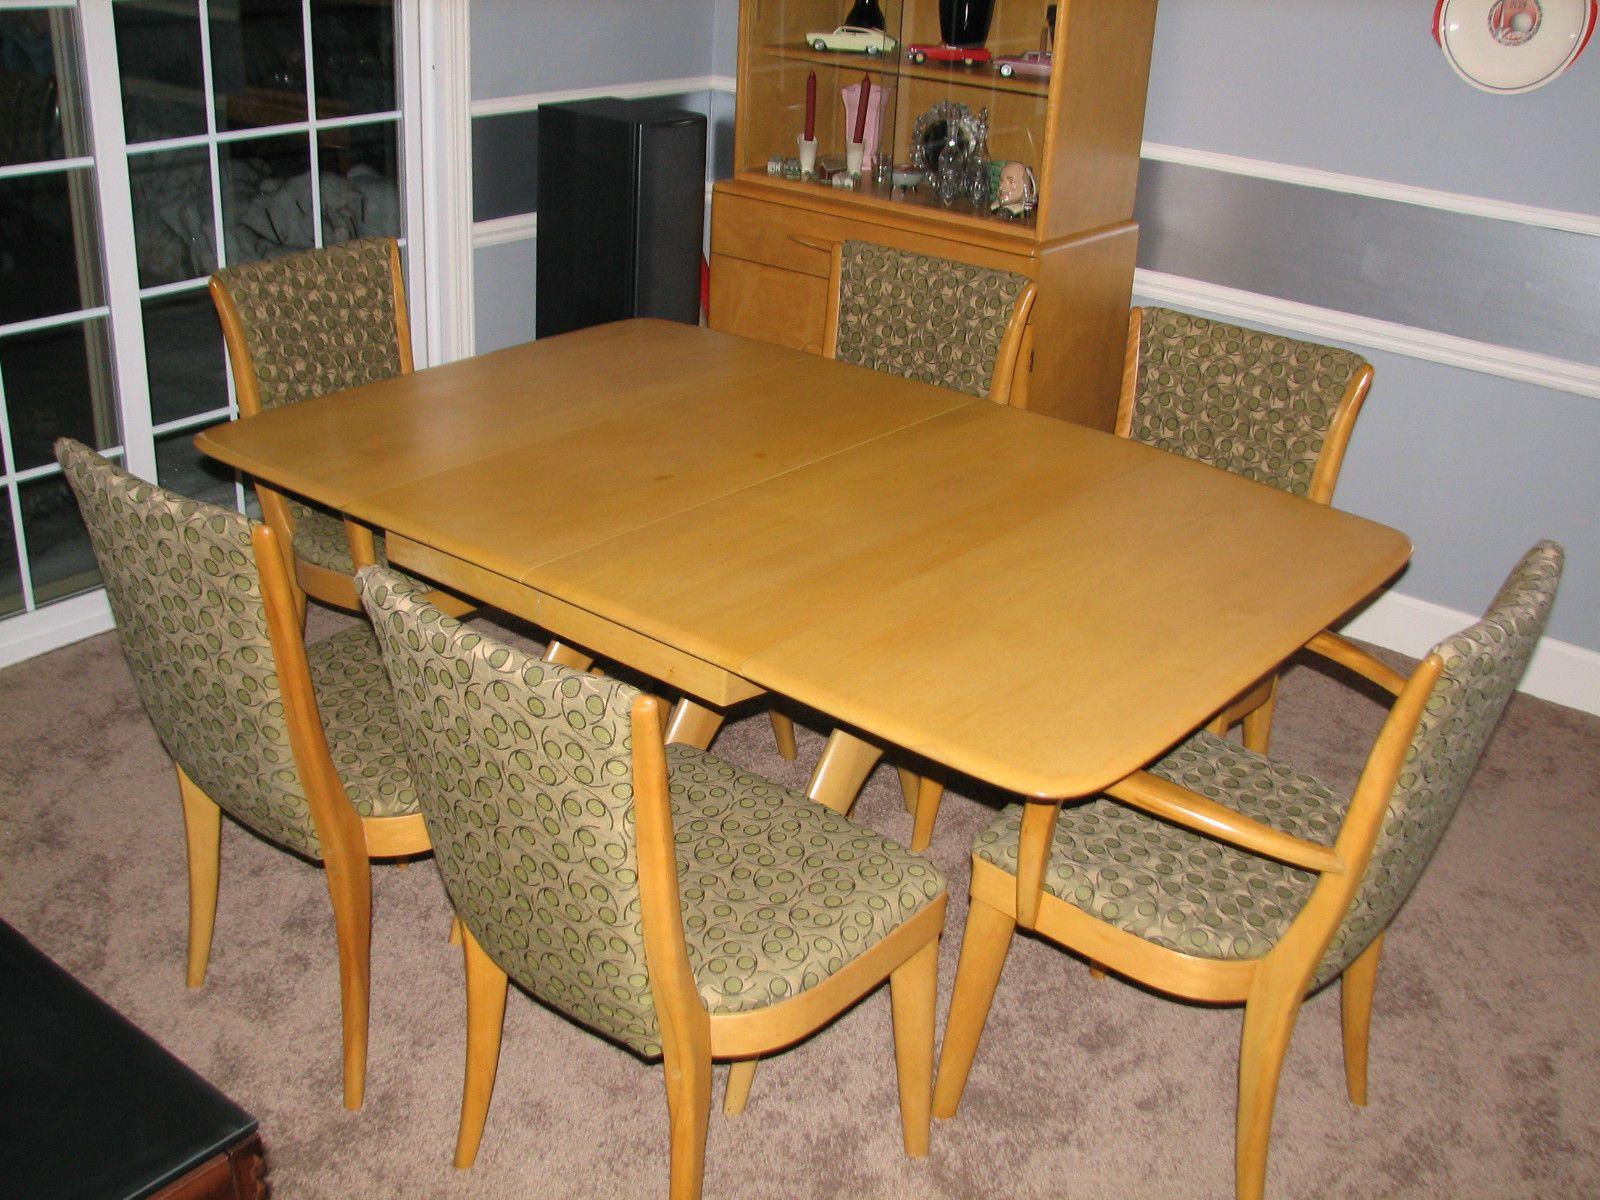 Heywood Wakefield Dinning Table Chairs Wheat Original Finish Mid